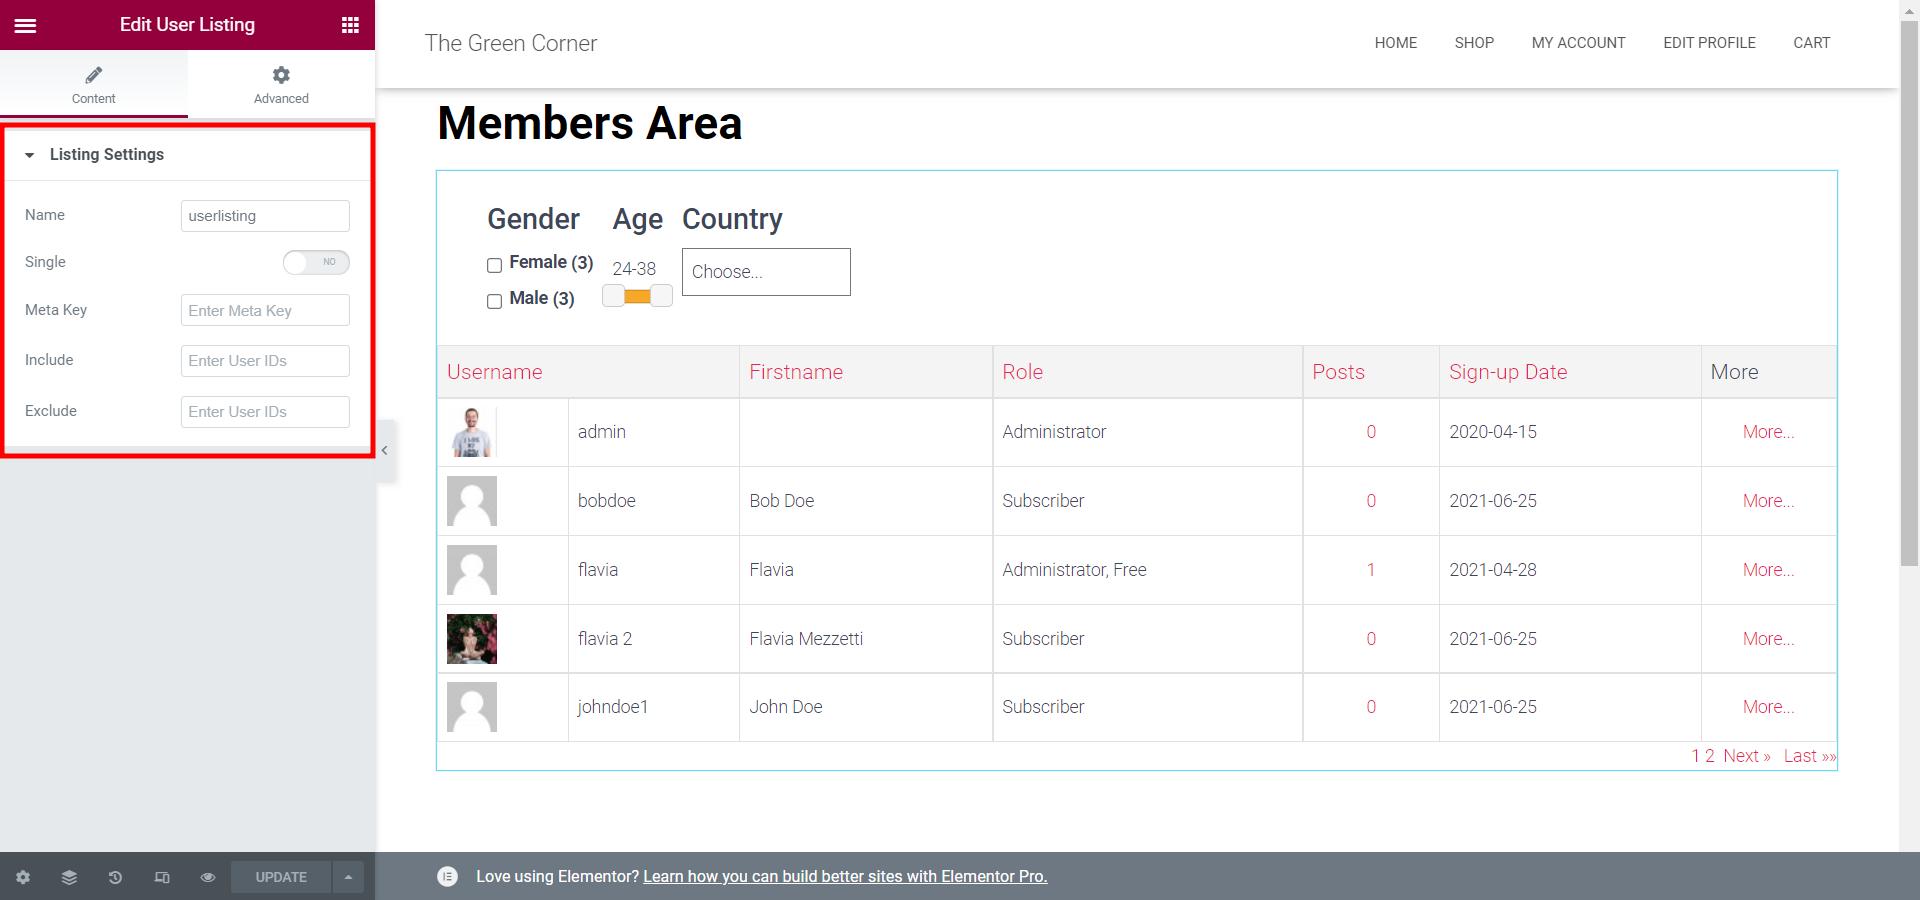 User Listing Widget Customization